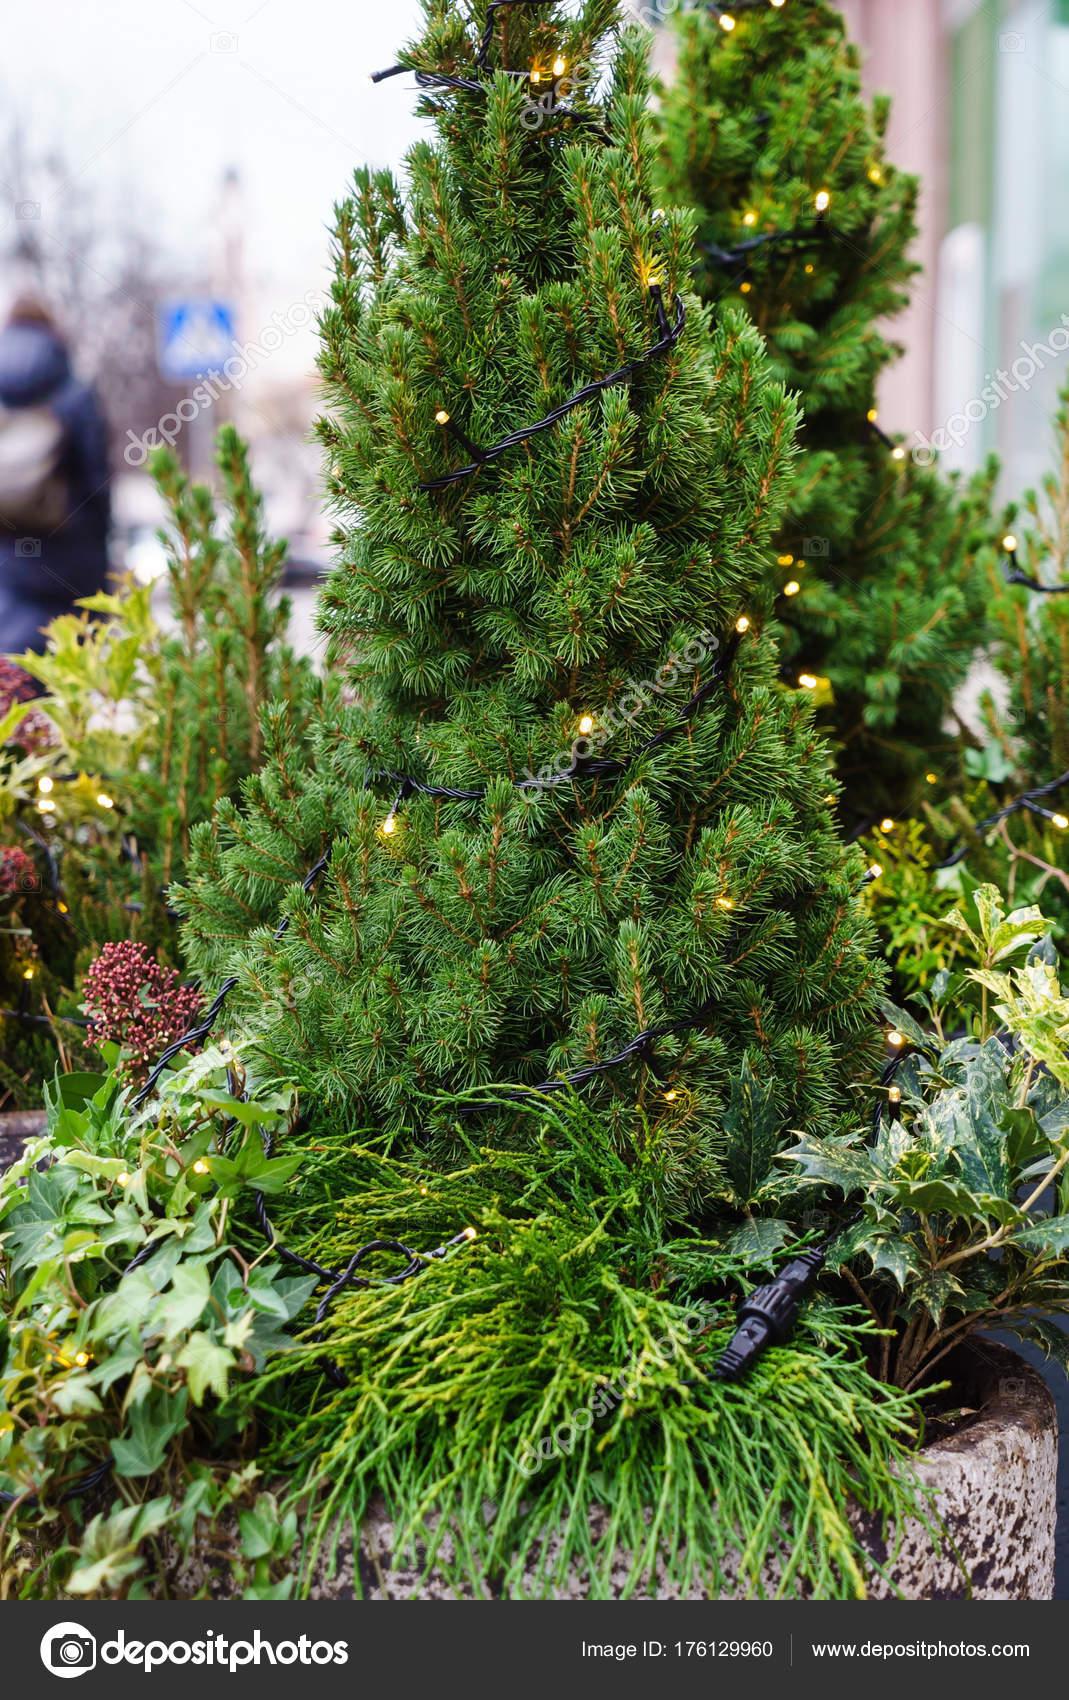 plante d extrieur hiver awesome azale extrieur hiver with plante d extrieur hiver stunning. Black Bedroom Furniture Sets. Home Design Ideas